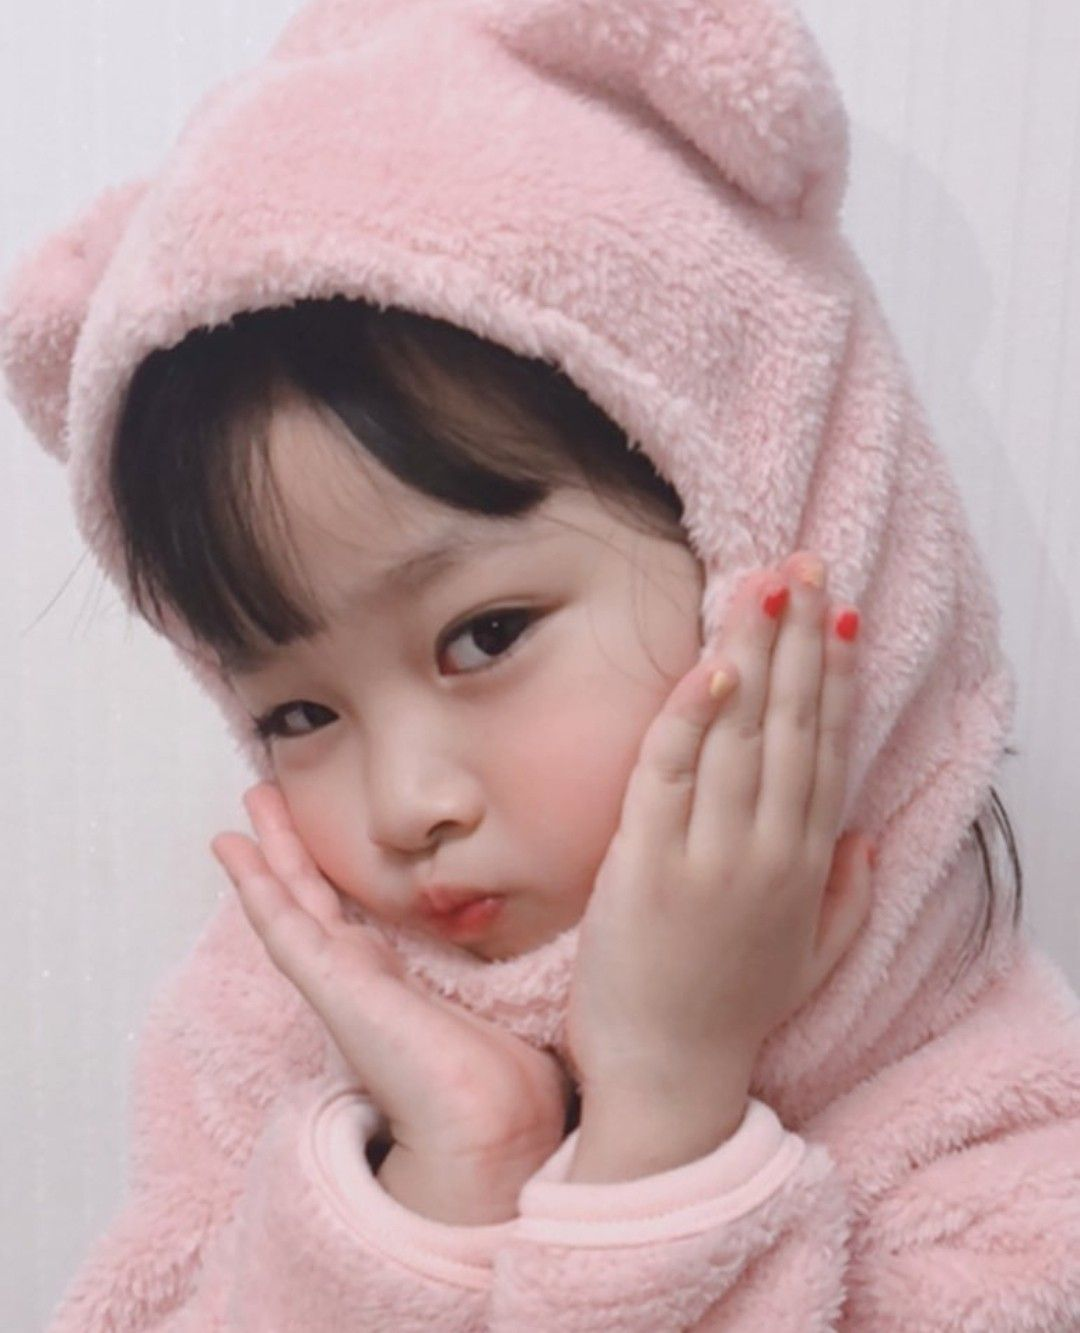 Gambar Sz Oleh Kemile Santos Gambar Bayi Gambar Bayi Lucu Foto